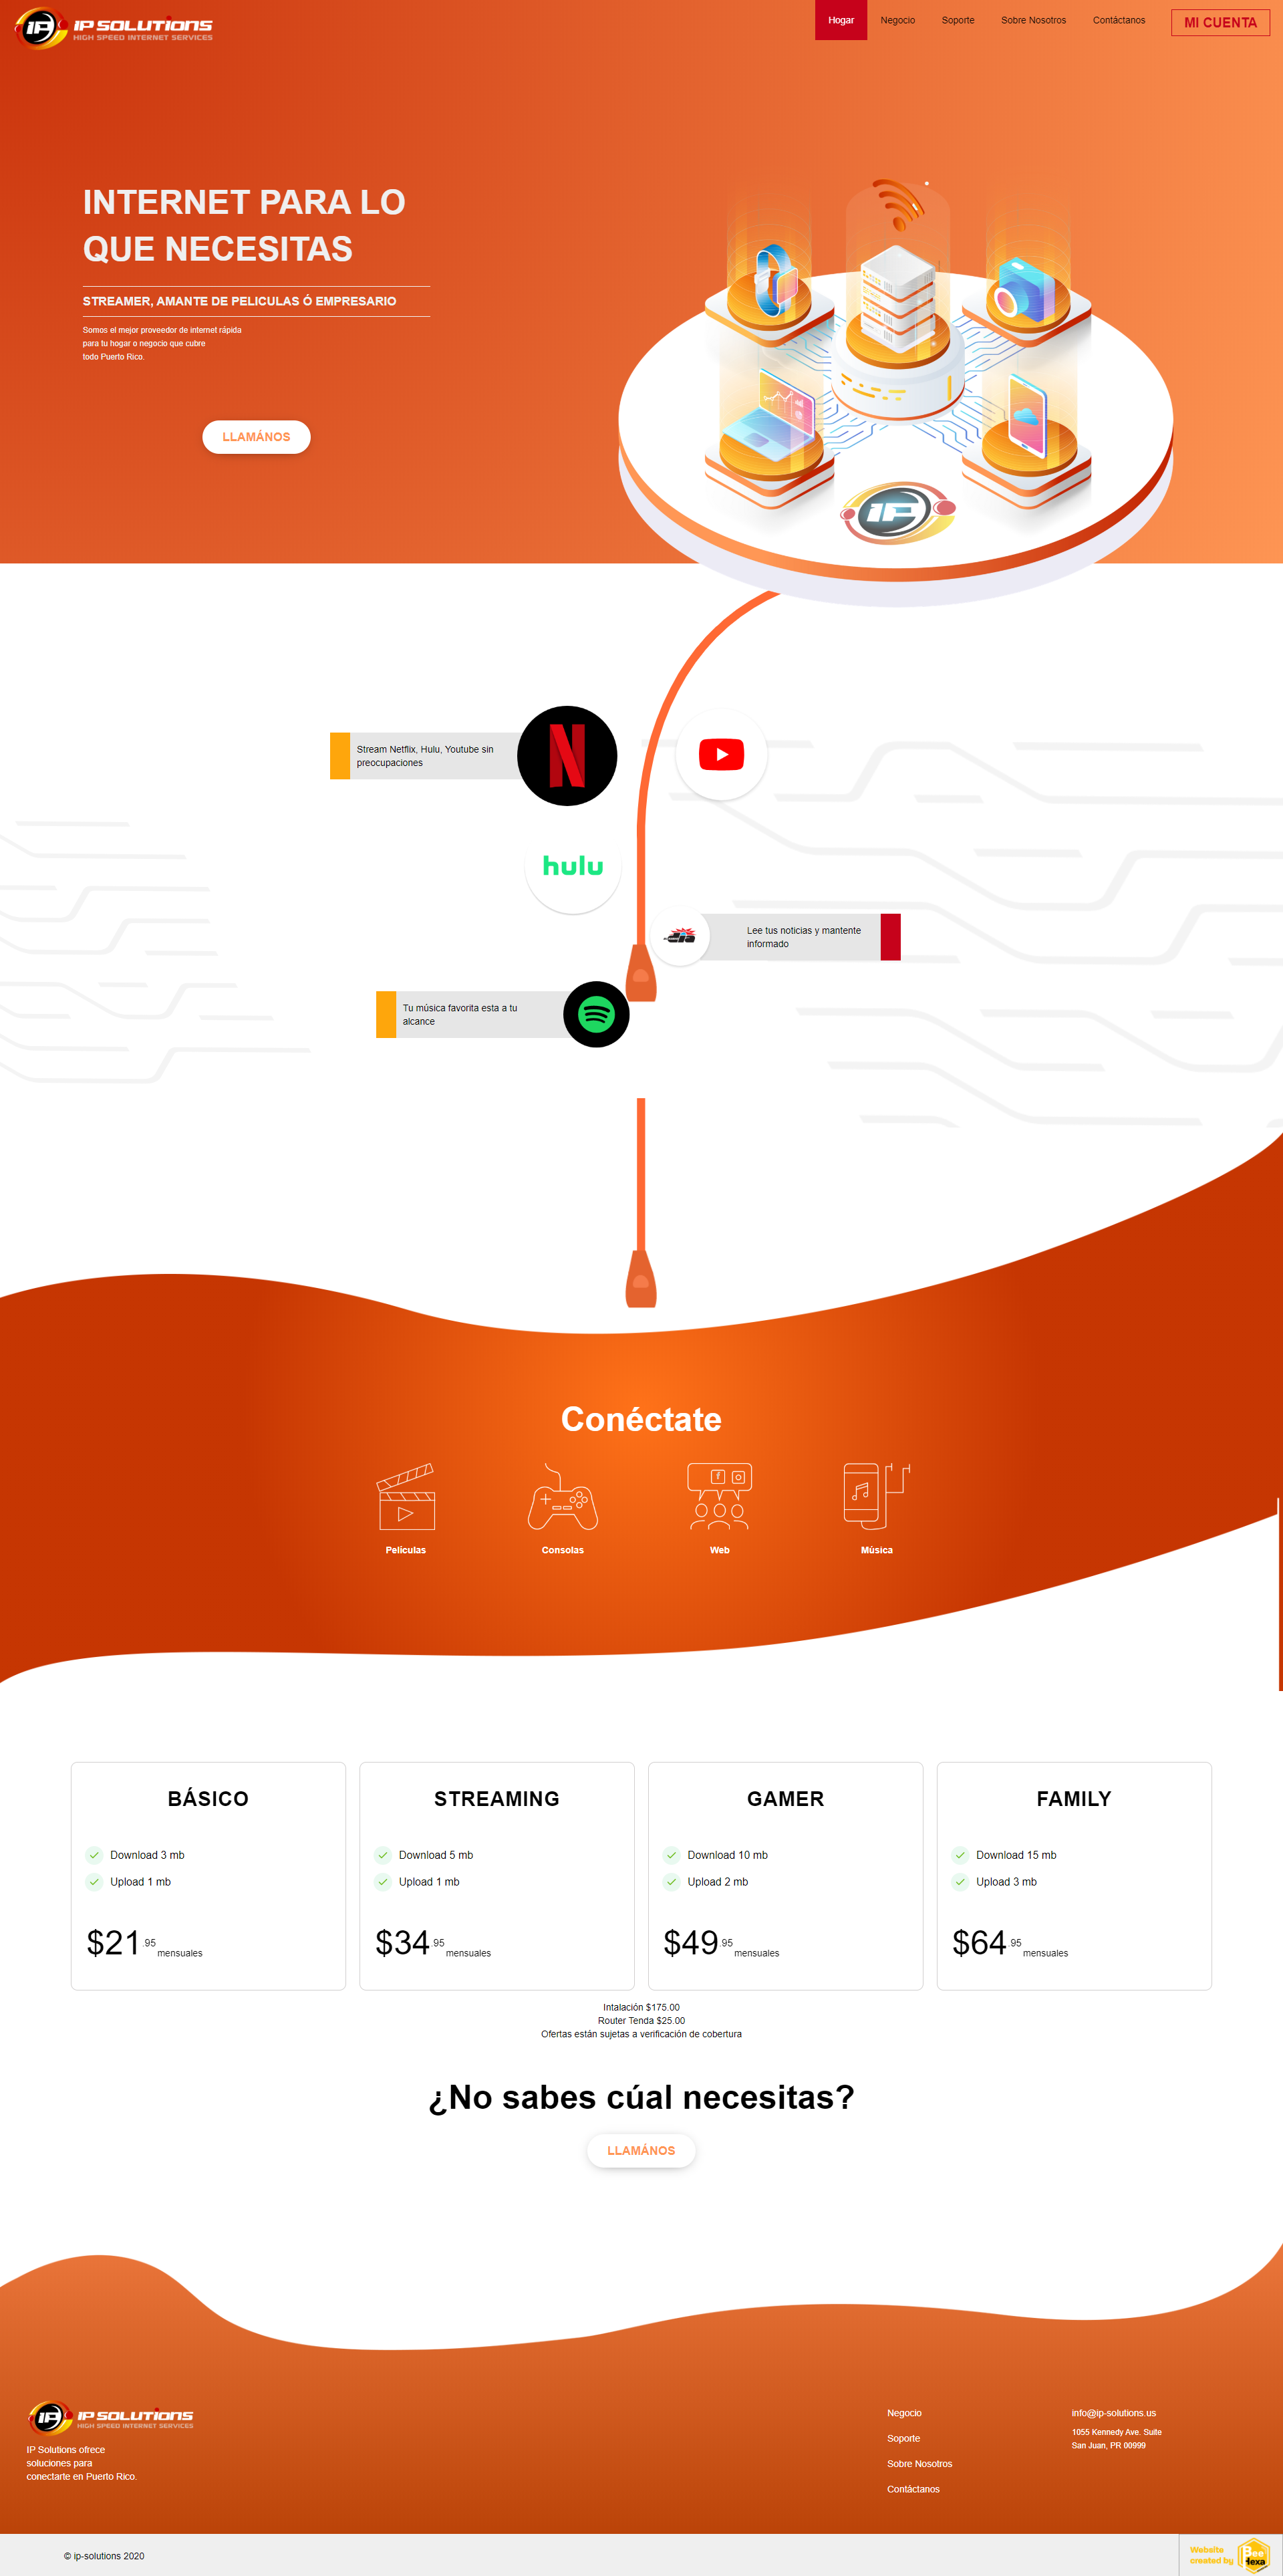 Portfolio Image of Service Internet Provider Web Design